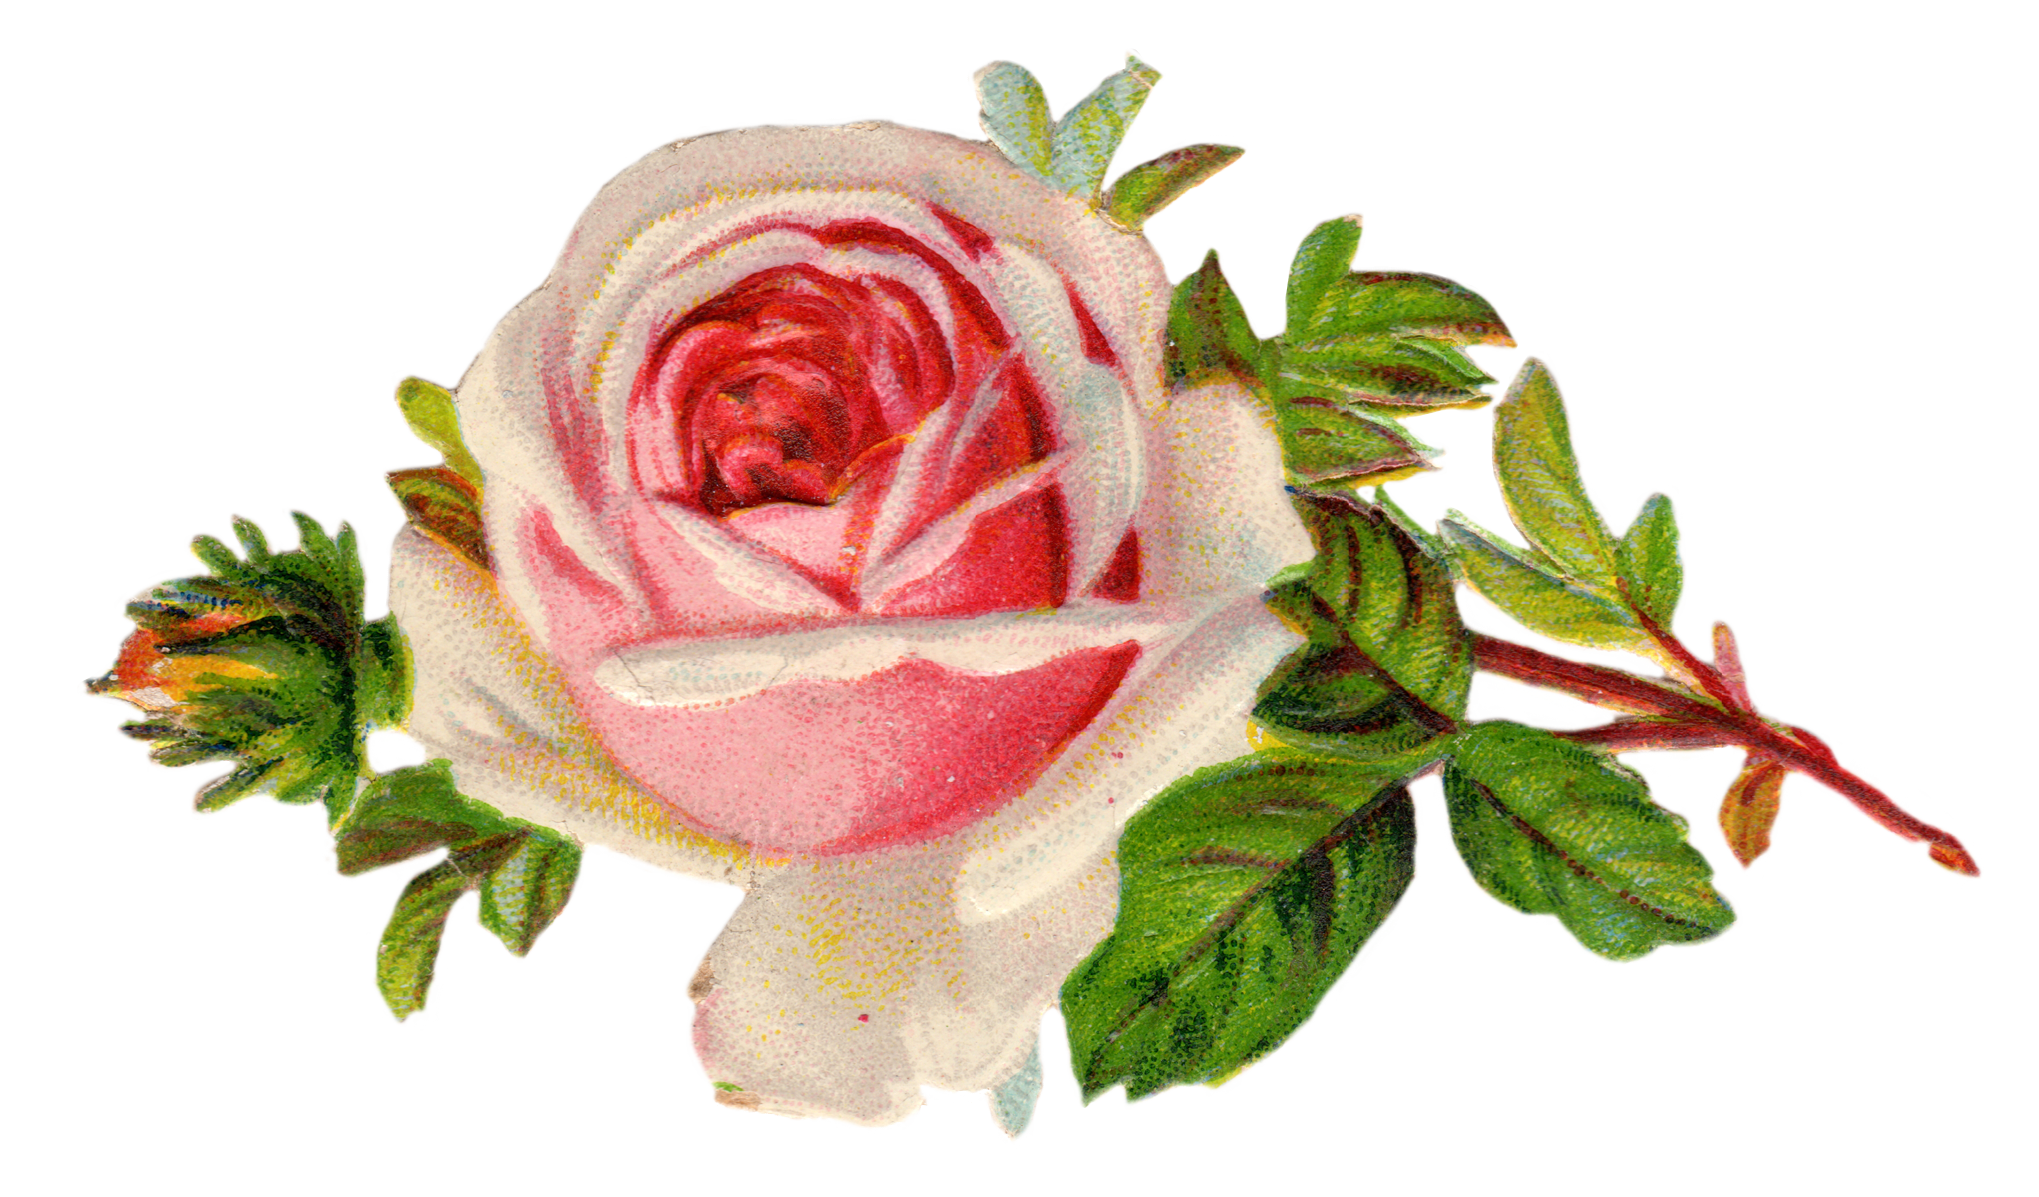 Vintage rose photo